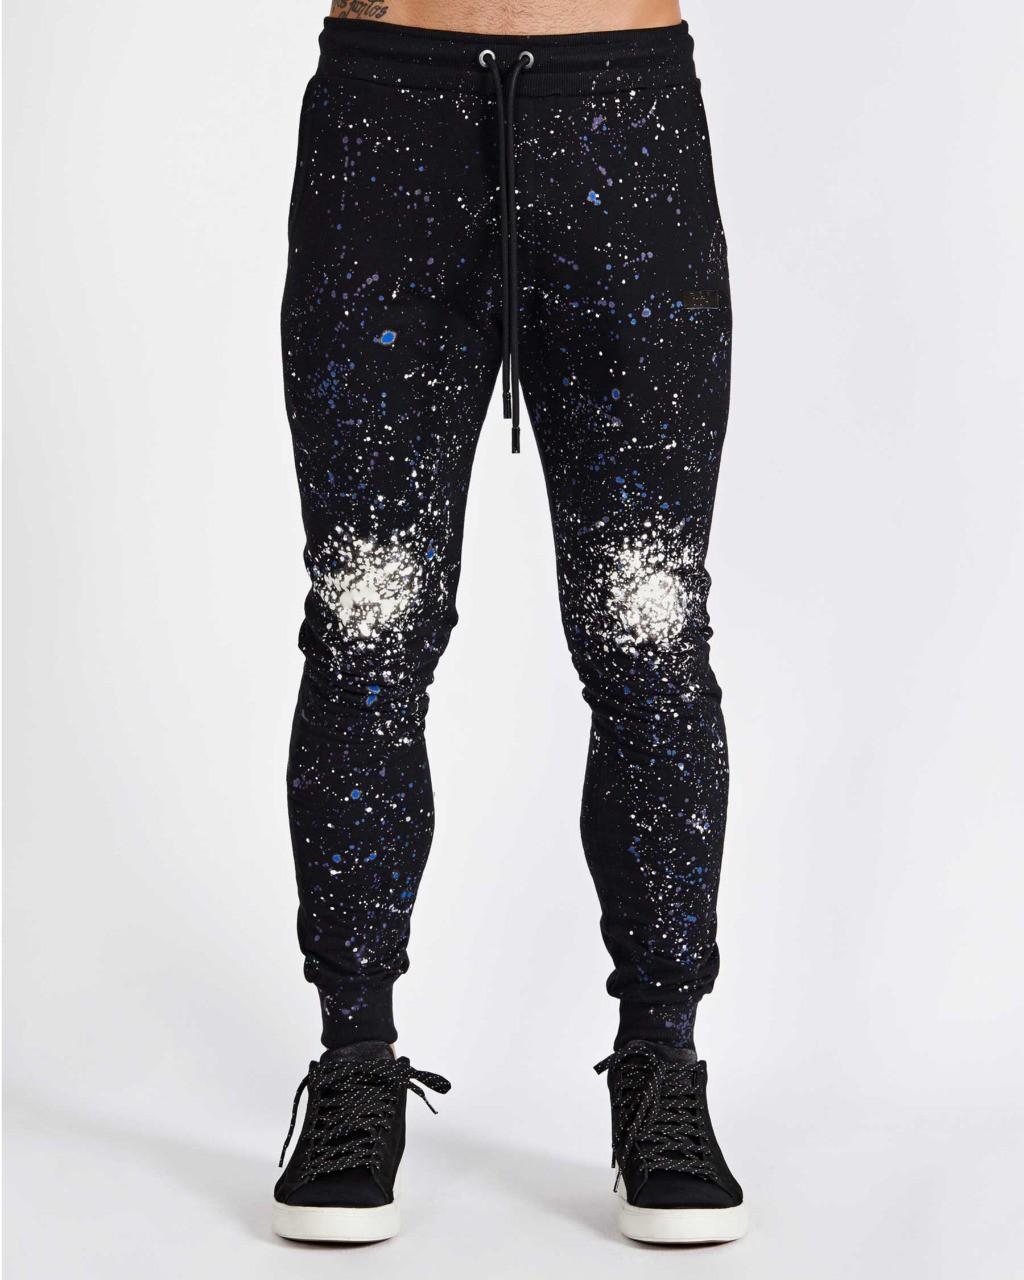 Calça Buh Galaxy Black